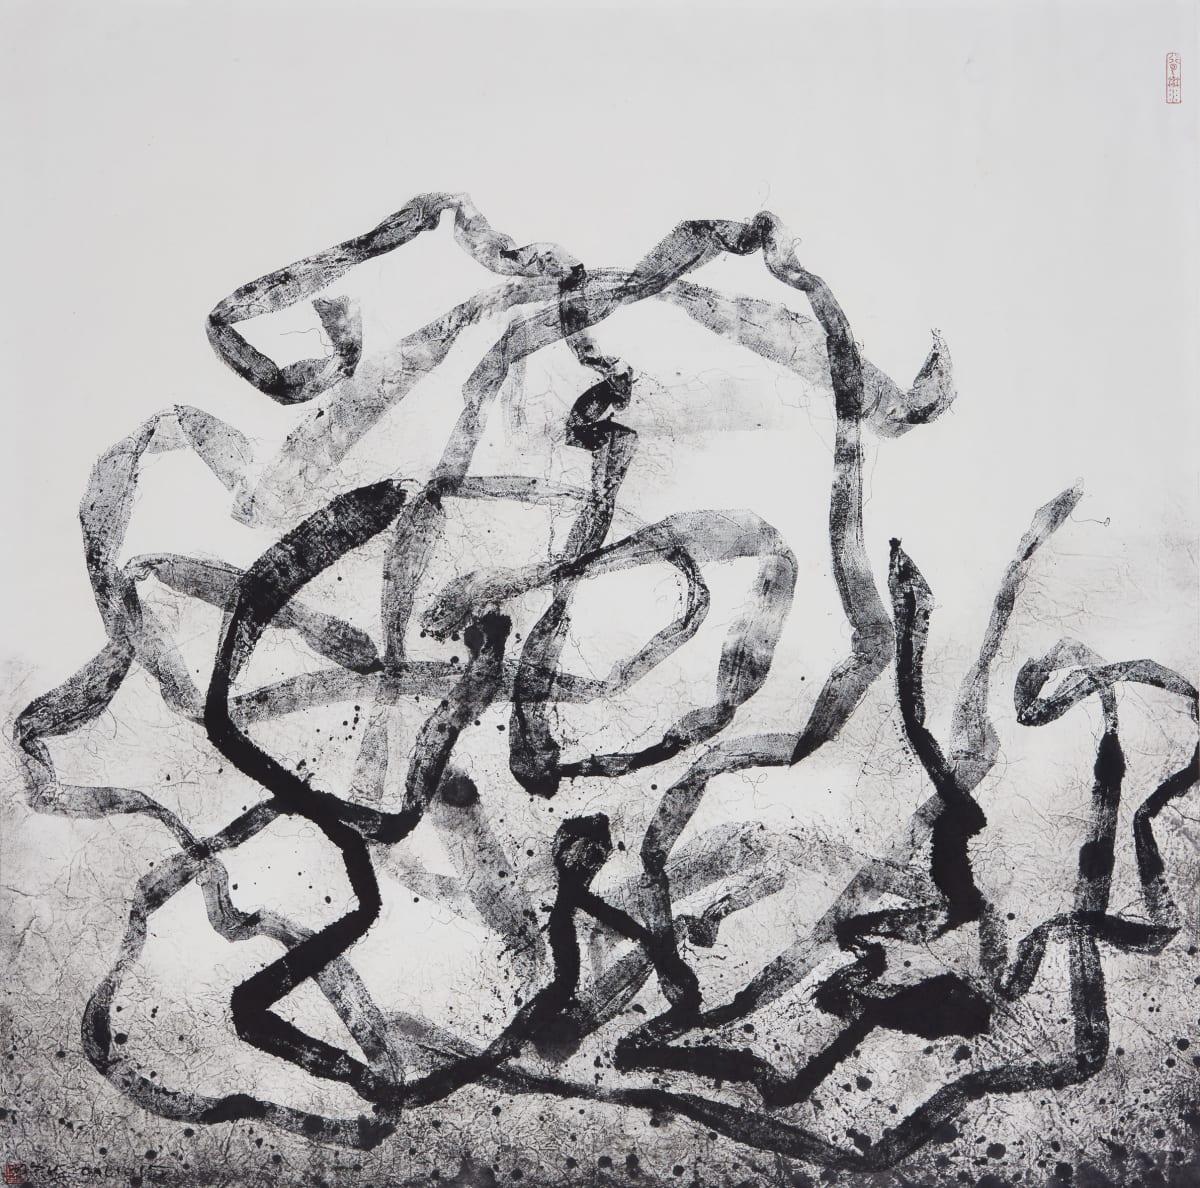 Wang Huangsheng 王璜生, Tracing Vision 161015 痕象 161015, 2016